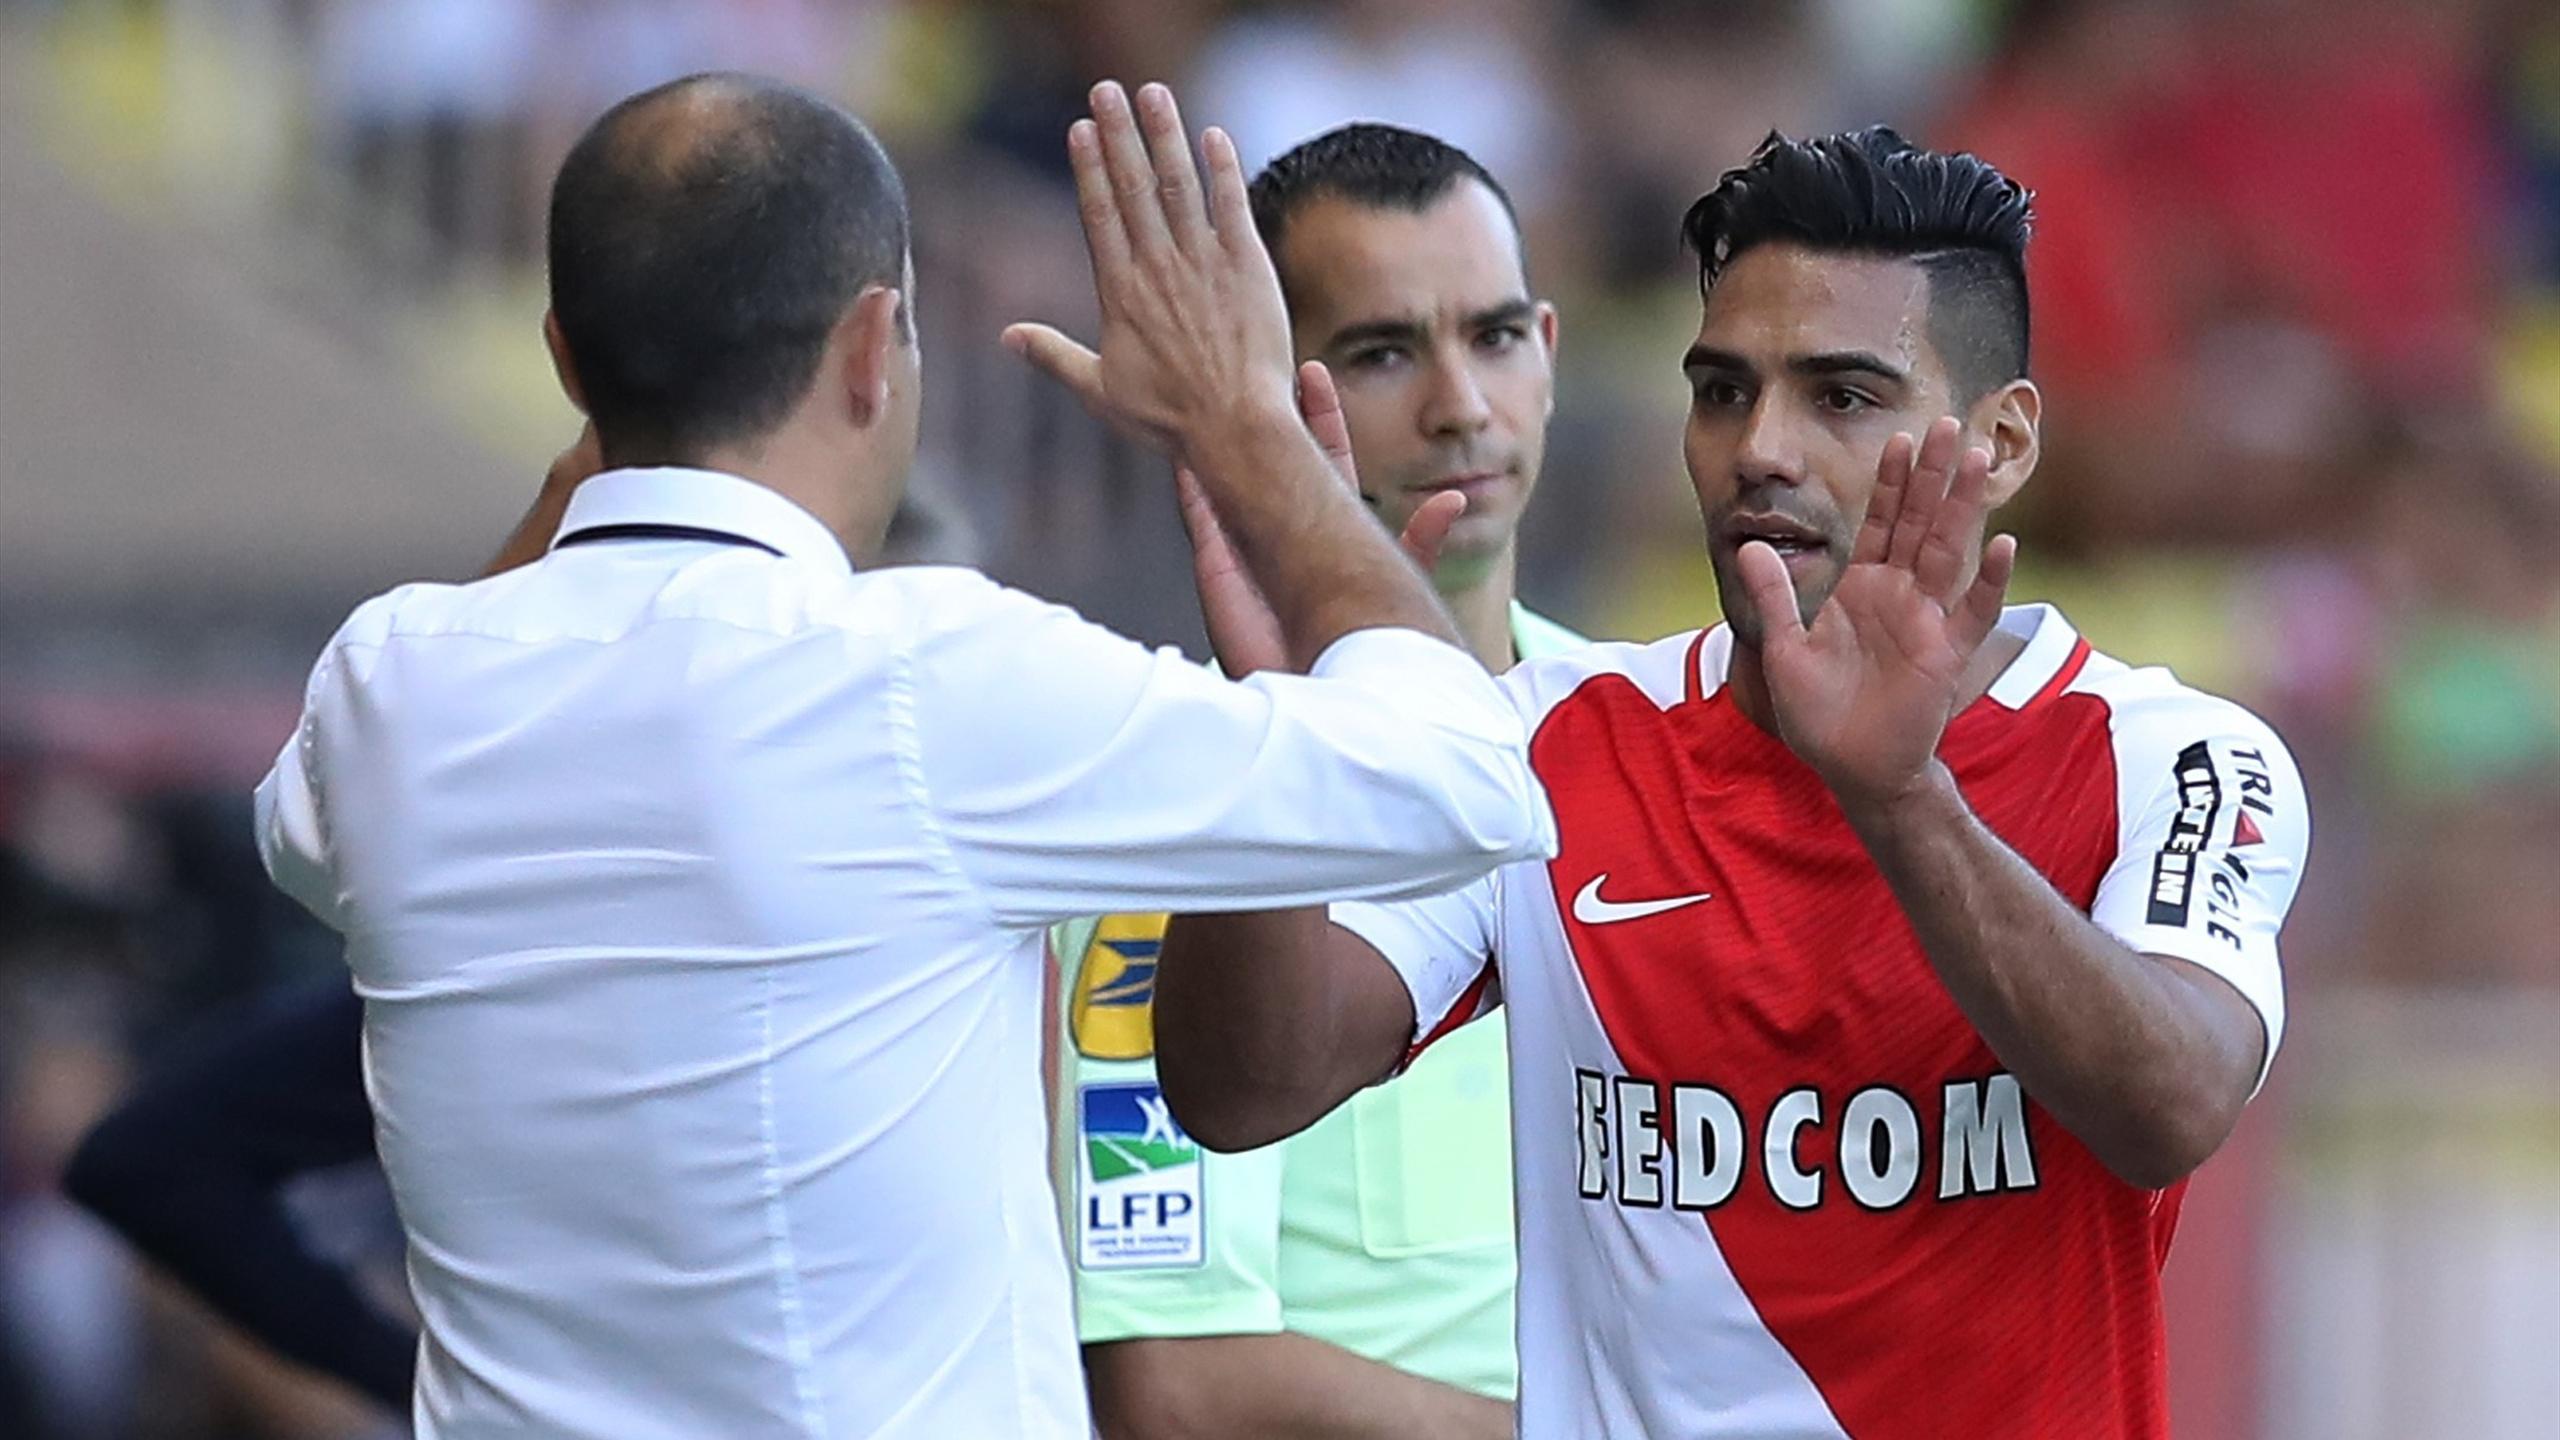 Radamel Falcao lors de Monaco - Rennes en Ligue 1 le 17 septembre 2016